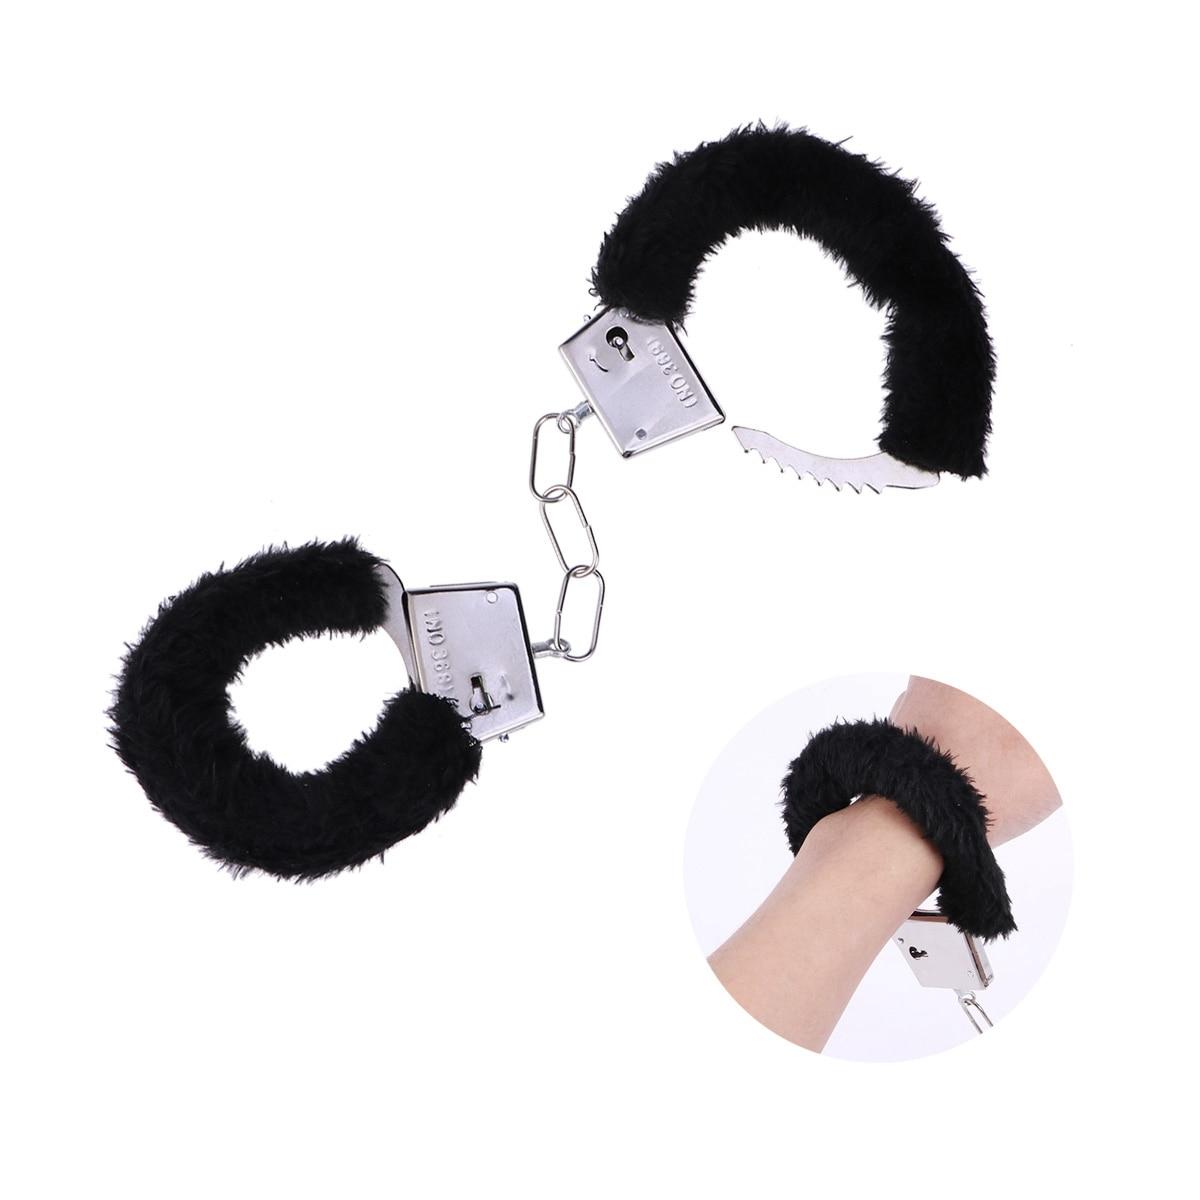 Adjustable Plush Handcuff For Sex Ankle Cuff Restraints BDSM Bondage Set Restraints Sex Adult Toys For Woman Exotic Accessories